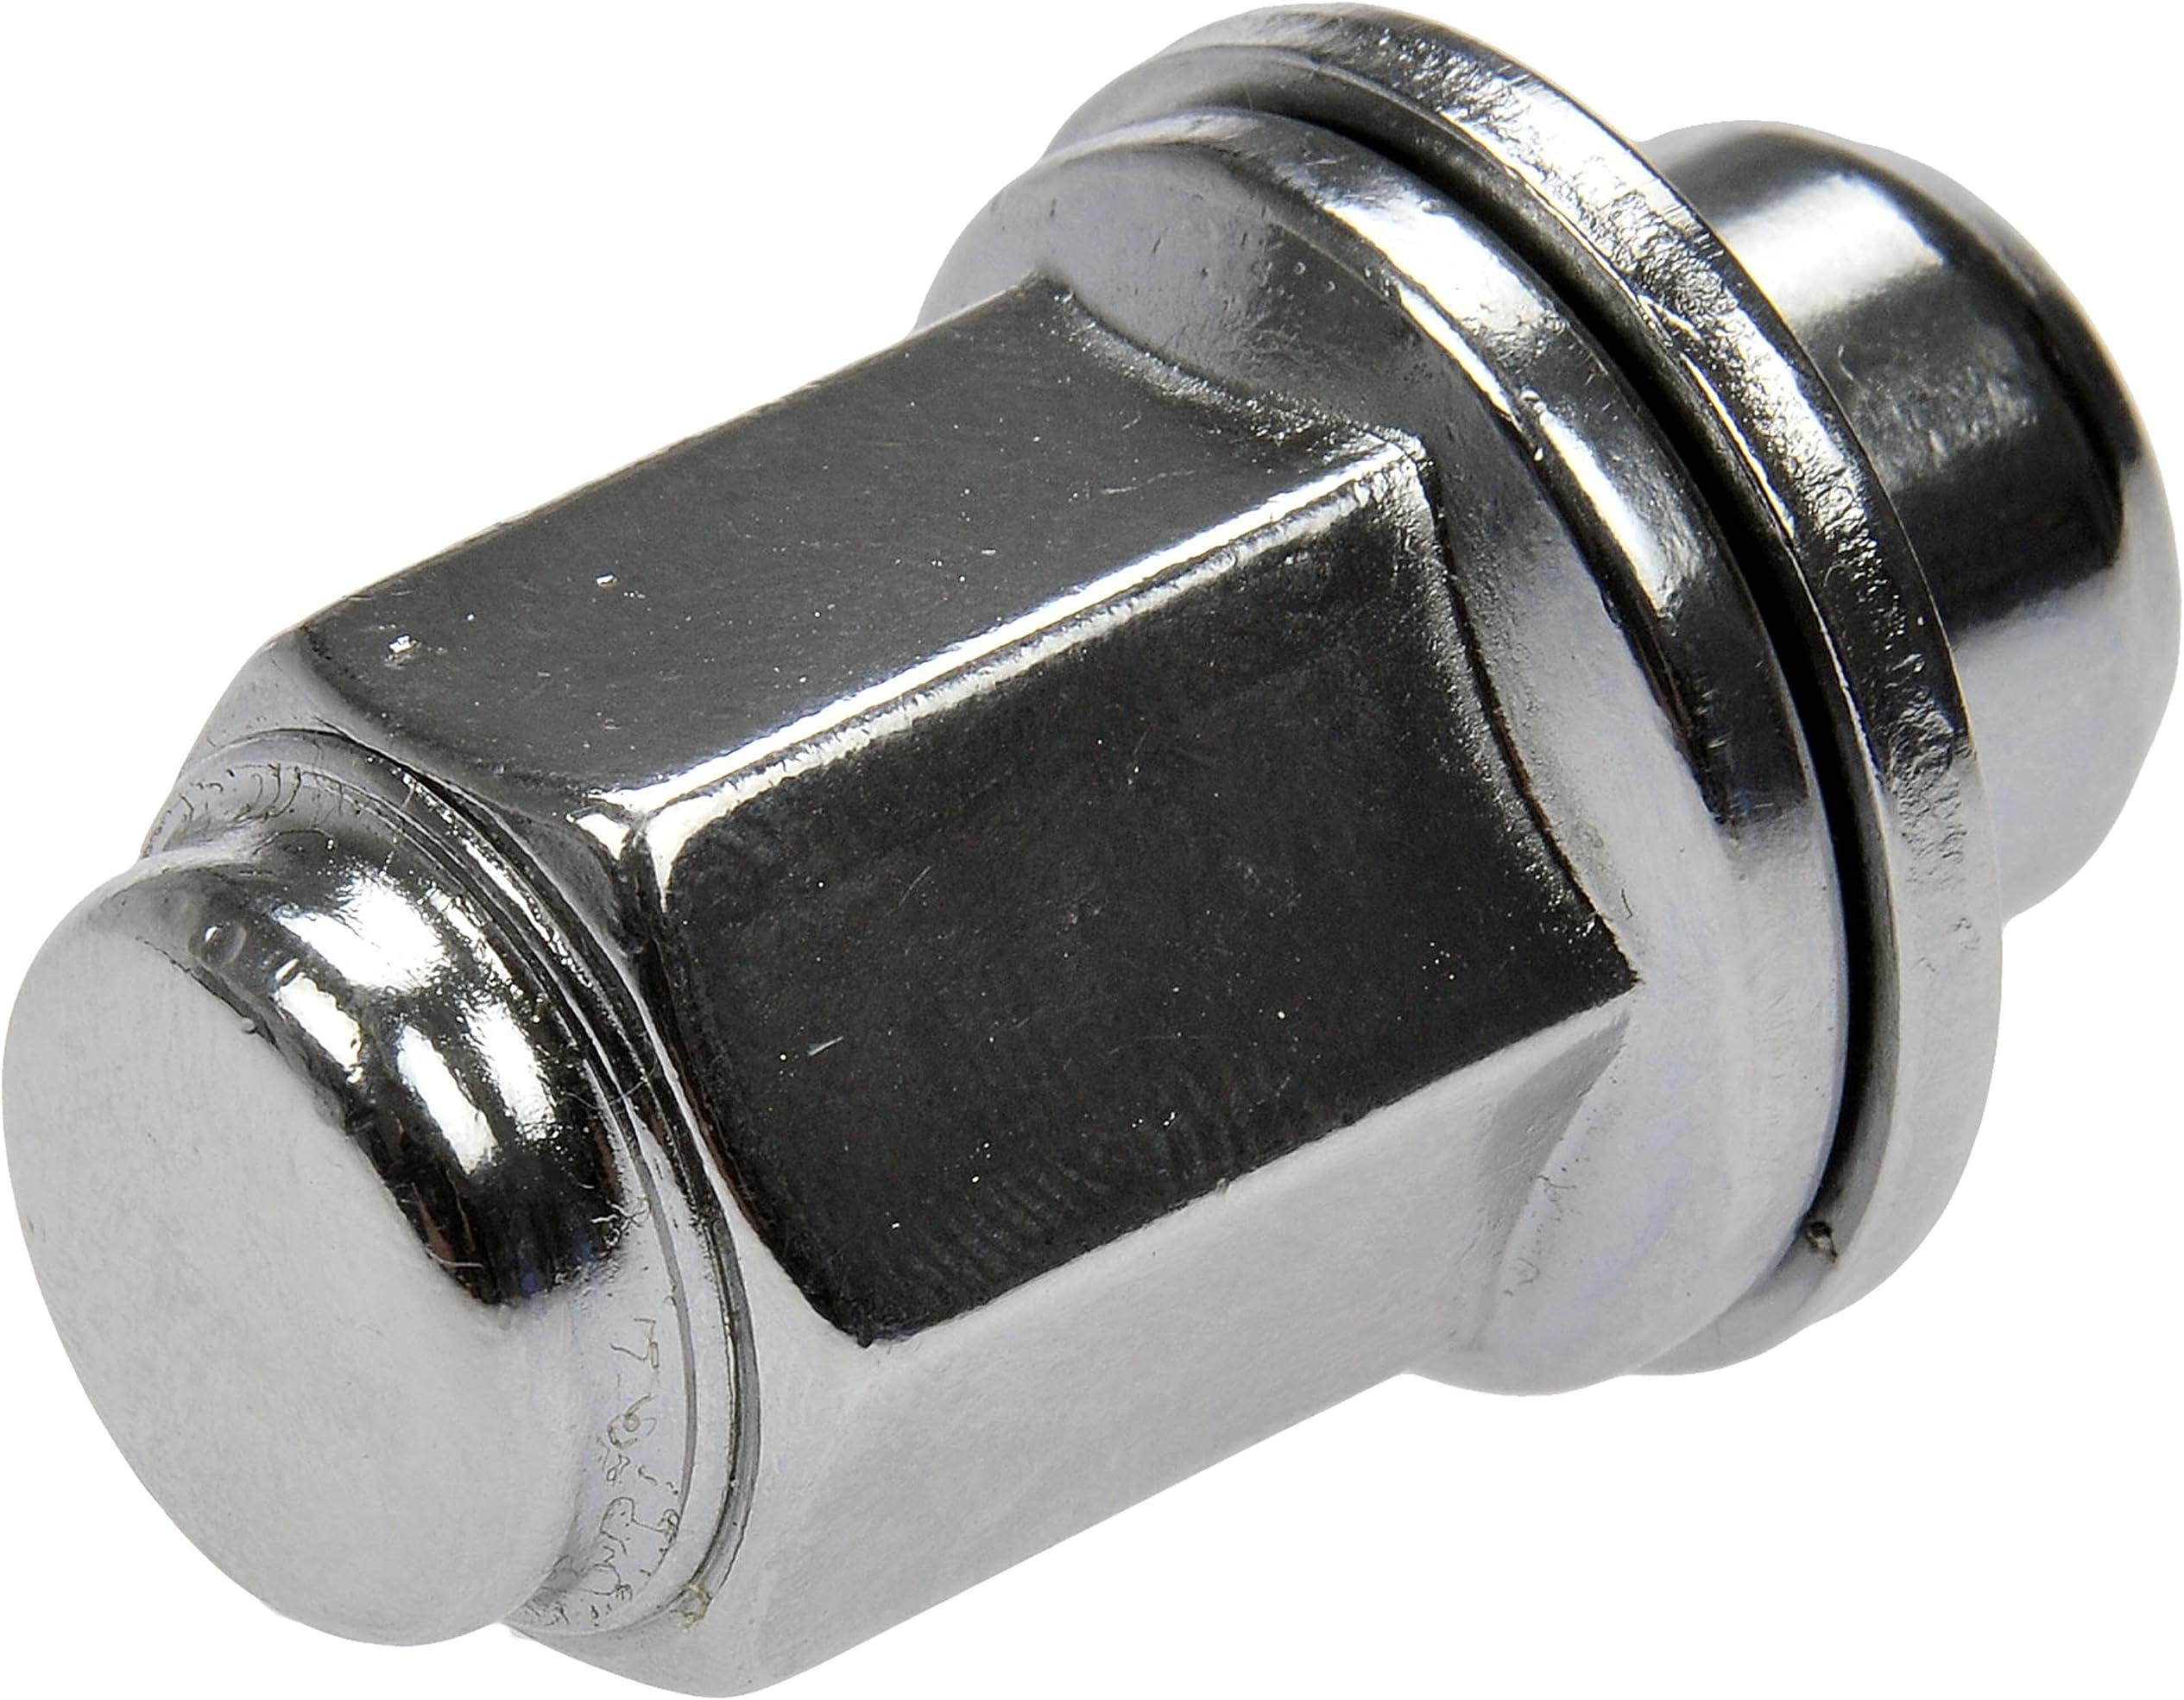 Dorman 611-212 Wheel Lug Nut for Select Toyota Models, Pack of 10 (OE FIX)